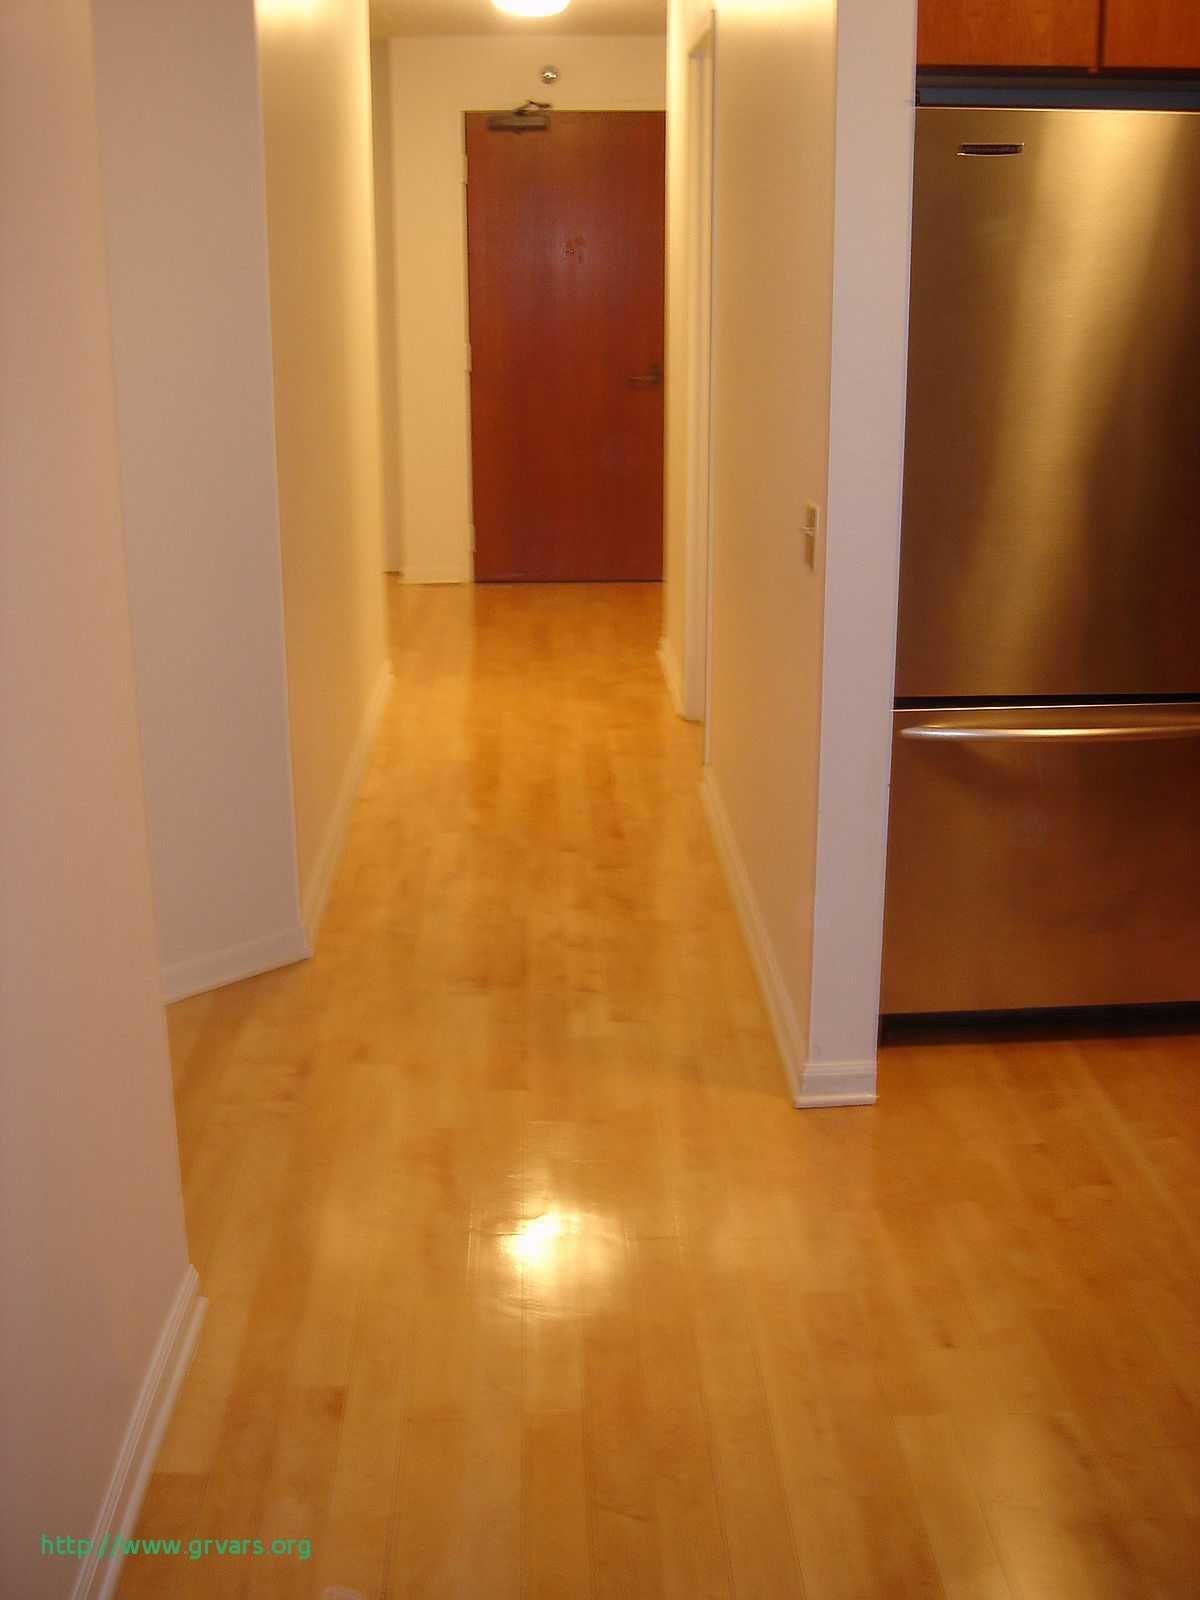 hardwood floor installation cost toronto of 24 beau best way to polish laminate flooring ideas blog for best way to polish laminate flooring luxe fabulous discount hardwood flooring 0 floor brampton 25 toronto